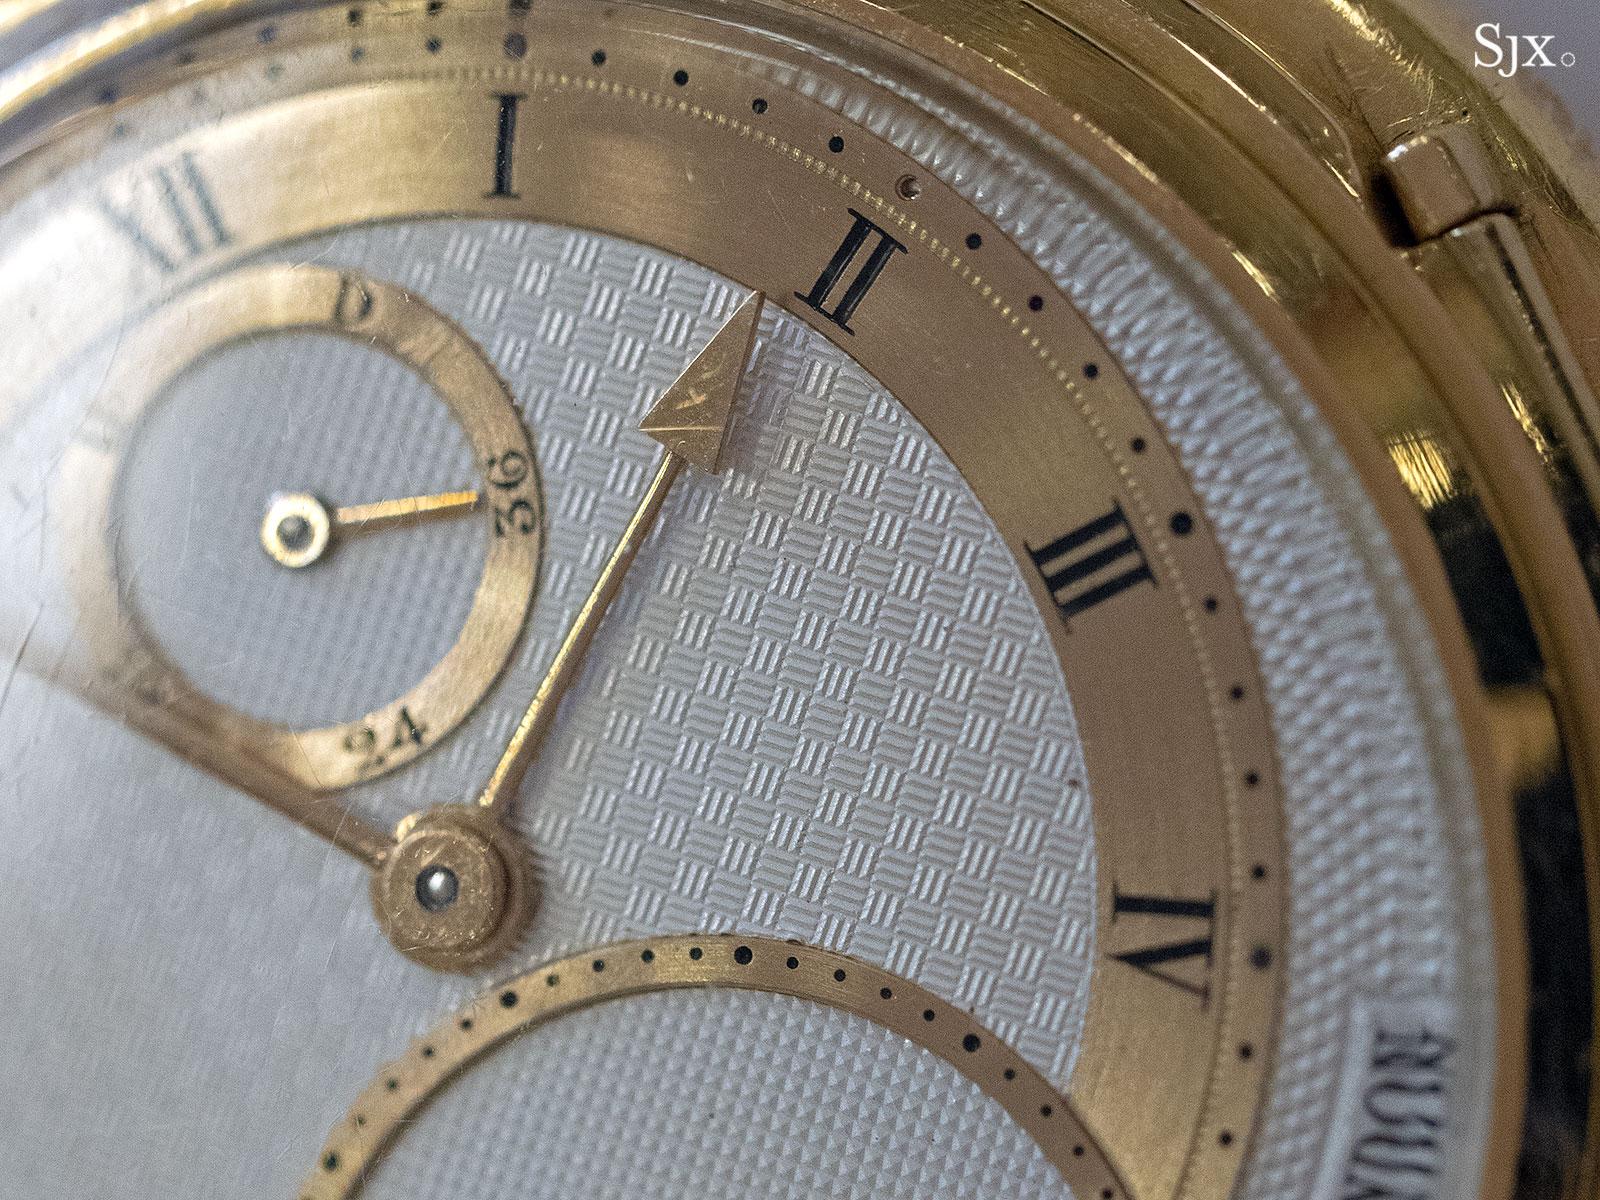 George Daniels Spring Case Tourbillon Wristwatch 6